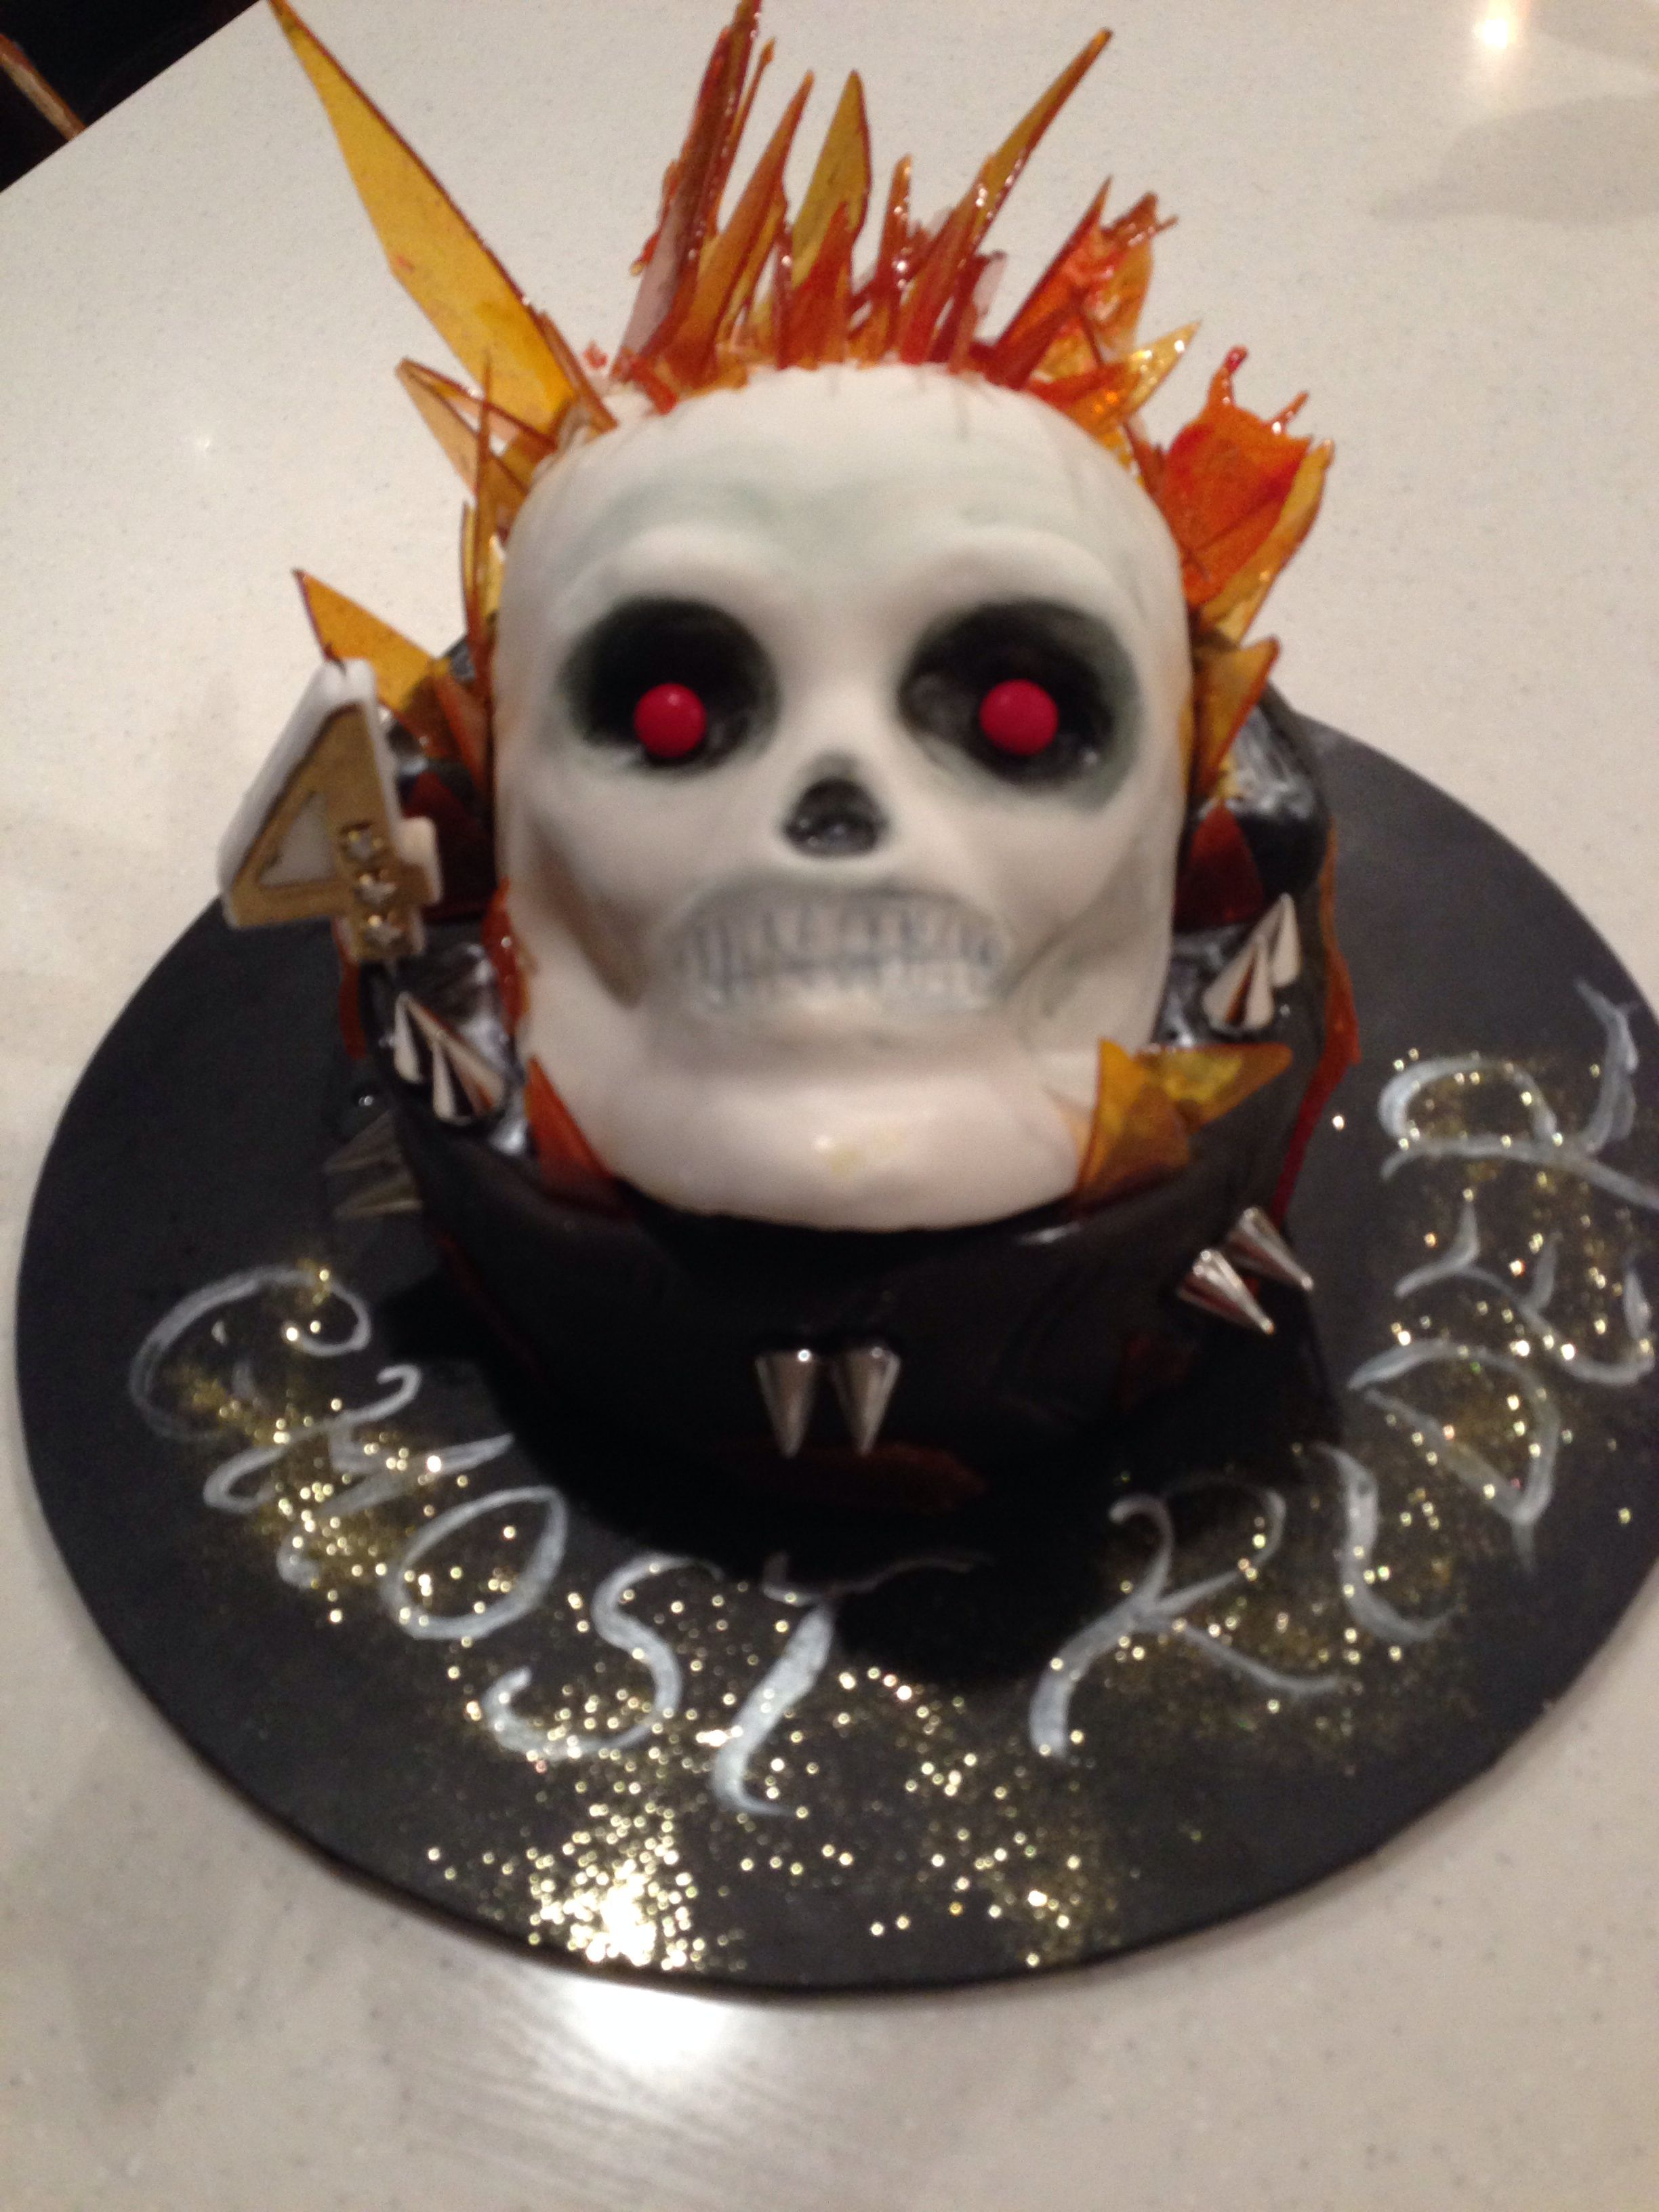 Choc mud ghost rider cake | Ghost rider | Pinterest